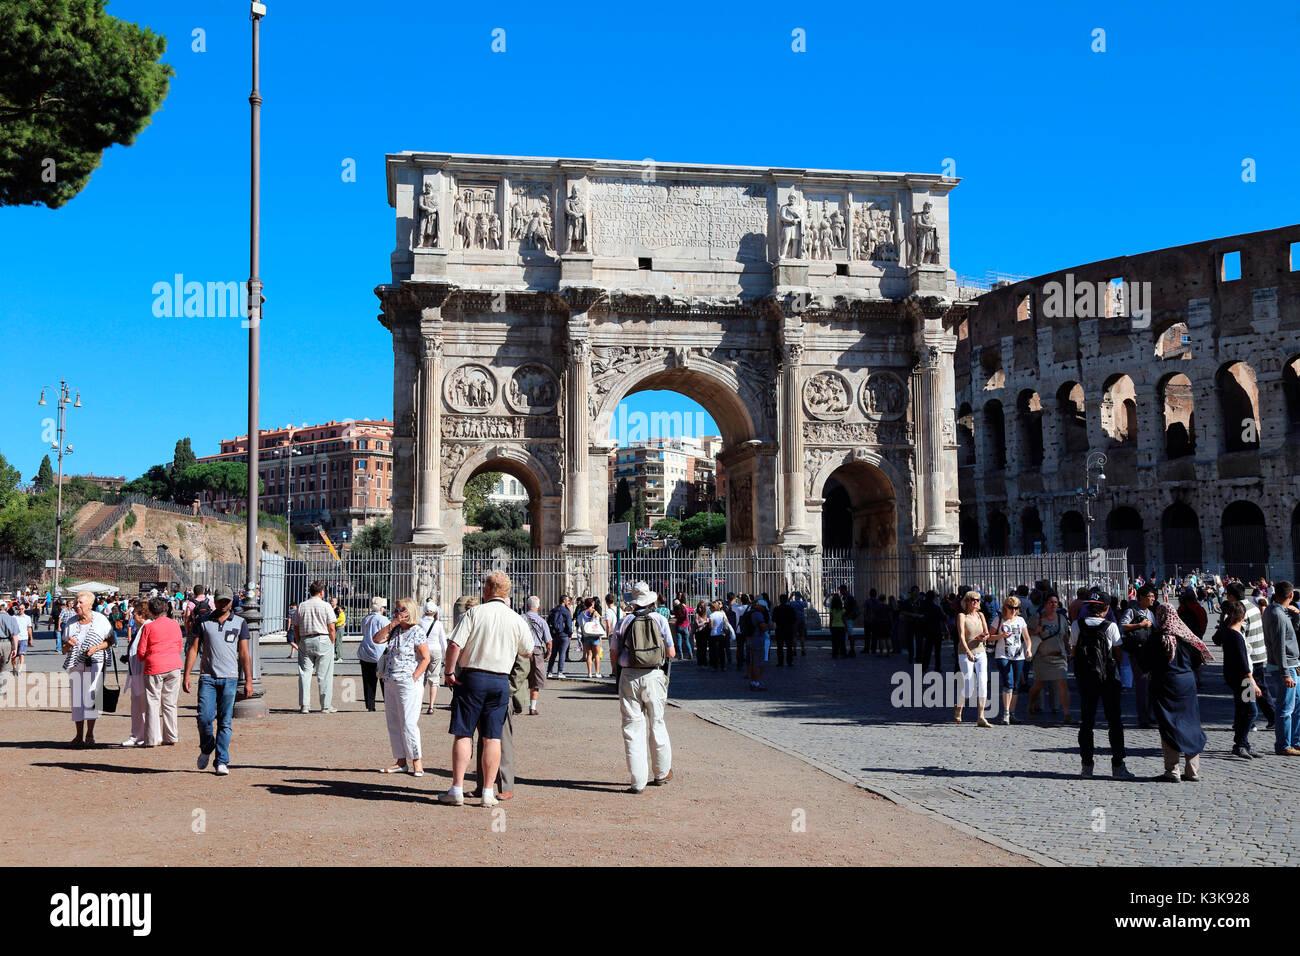 Italy Rome Arco di Costantino Arch of Constantine - Stock Image